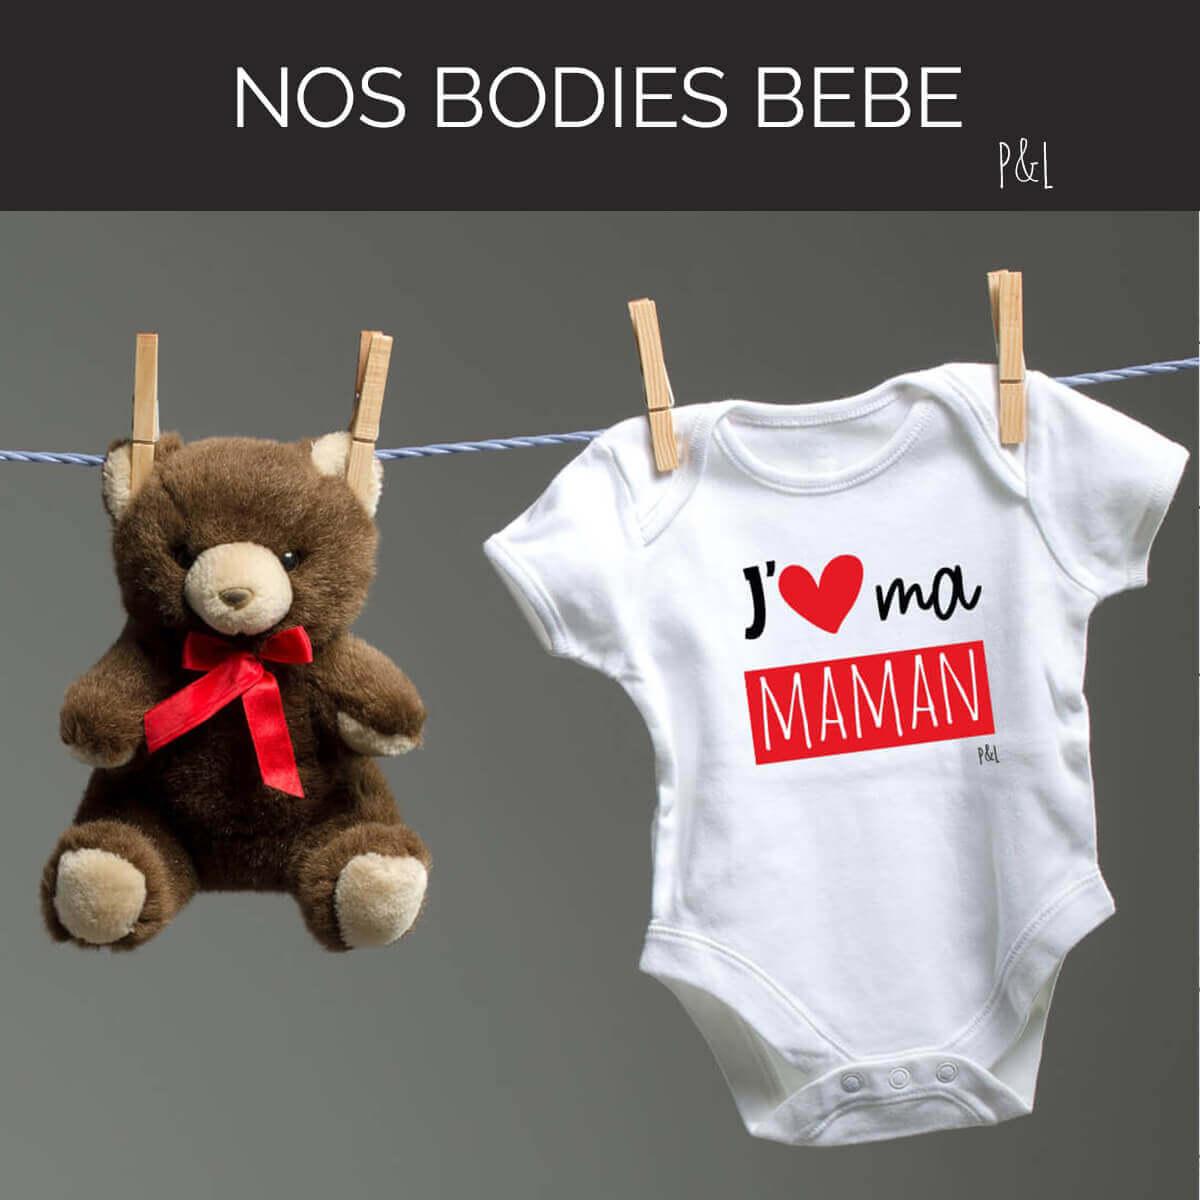 Nos bodies bébé